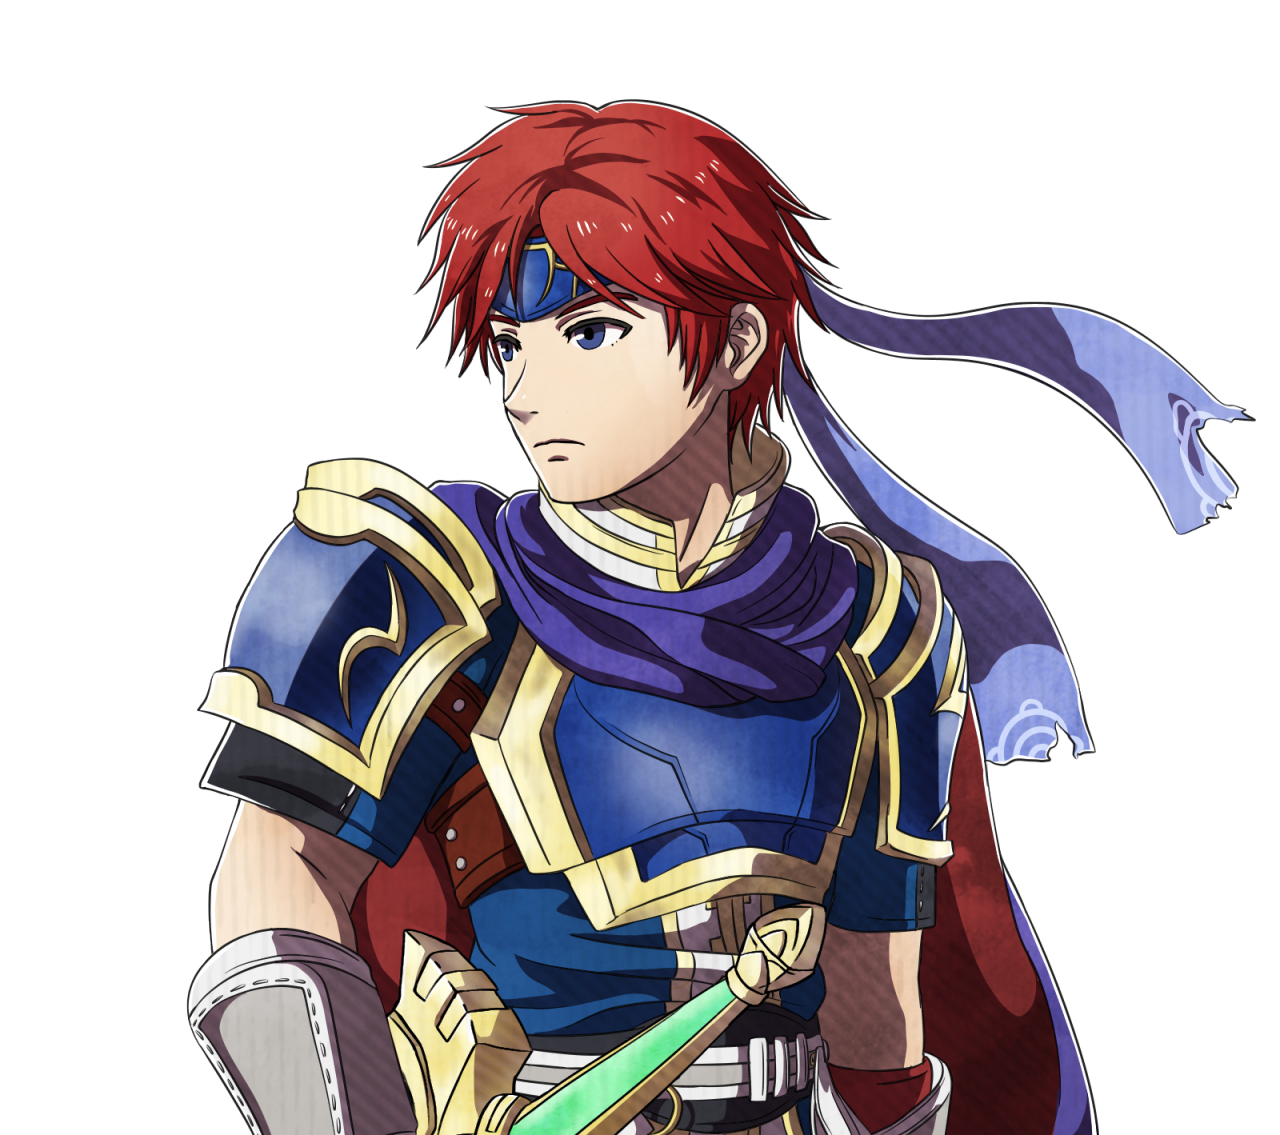 I found this tumblr art of Roy while browsing  Fates Roy